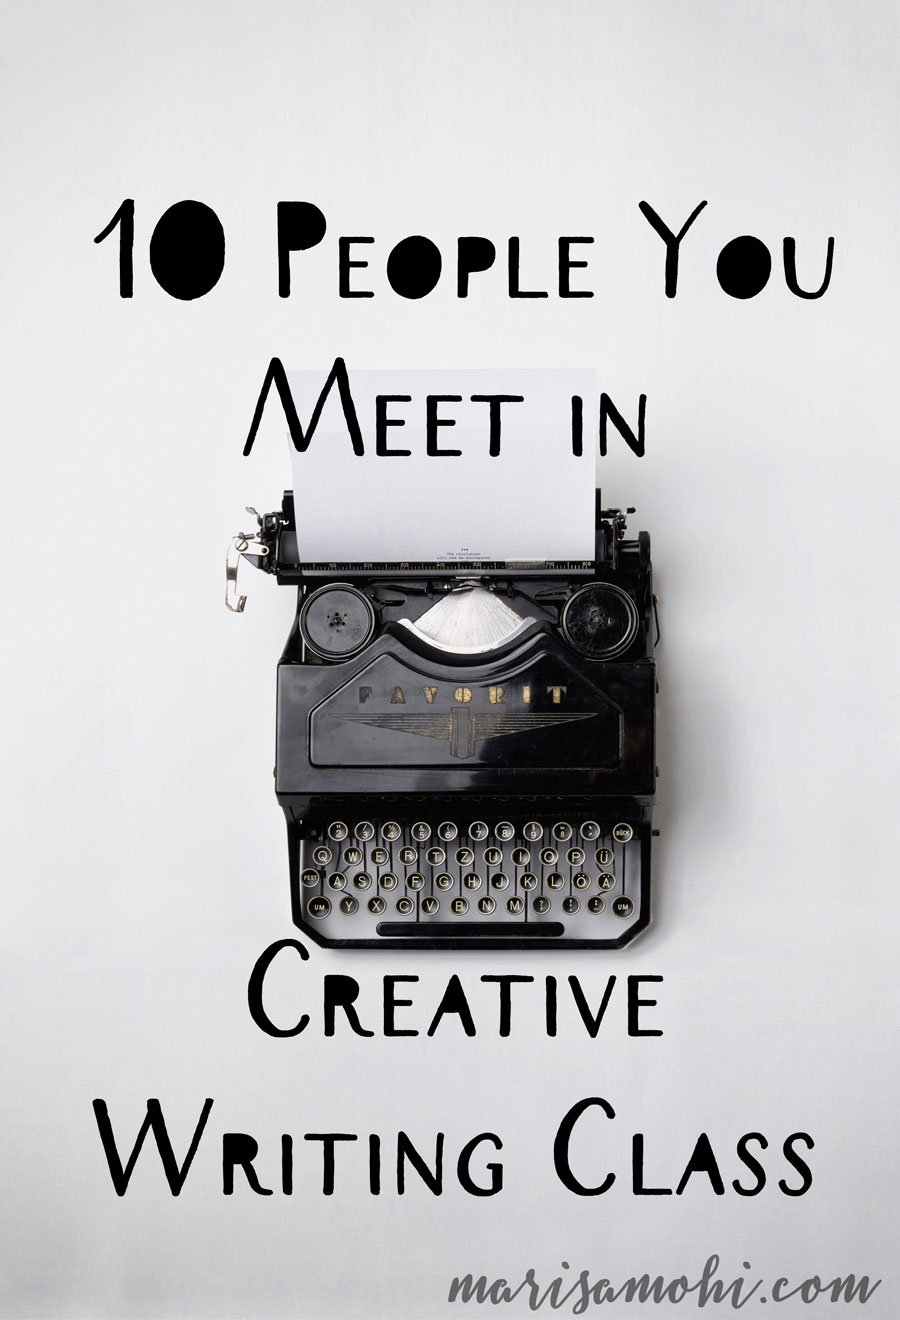 Creative Writing Class